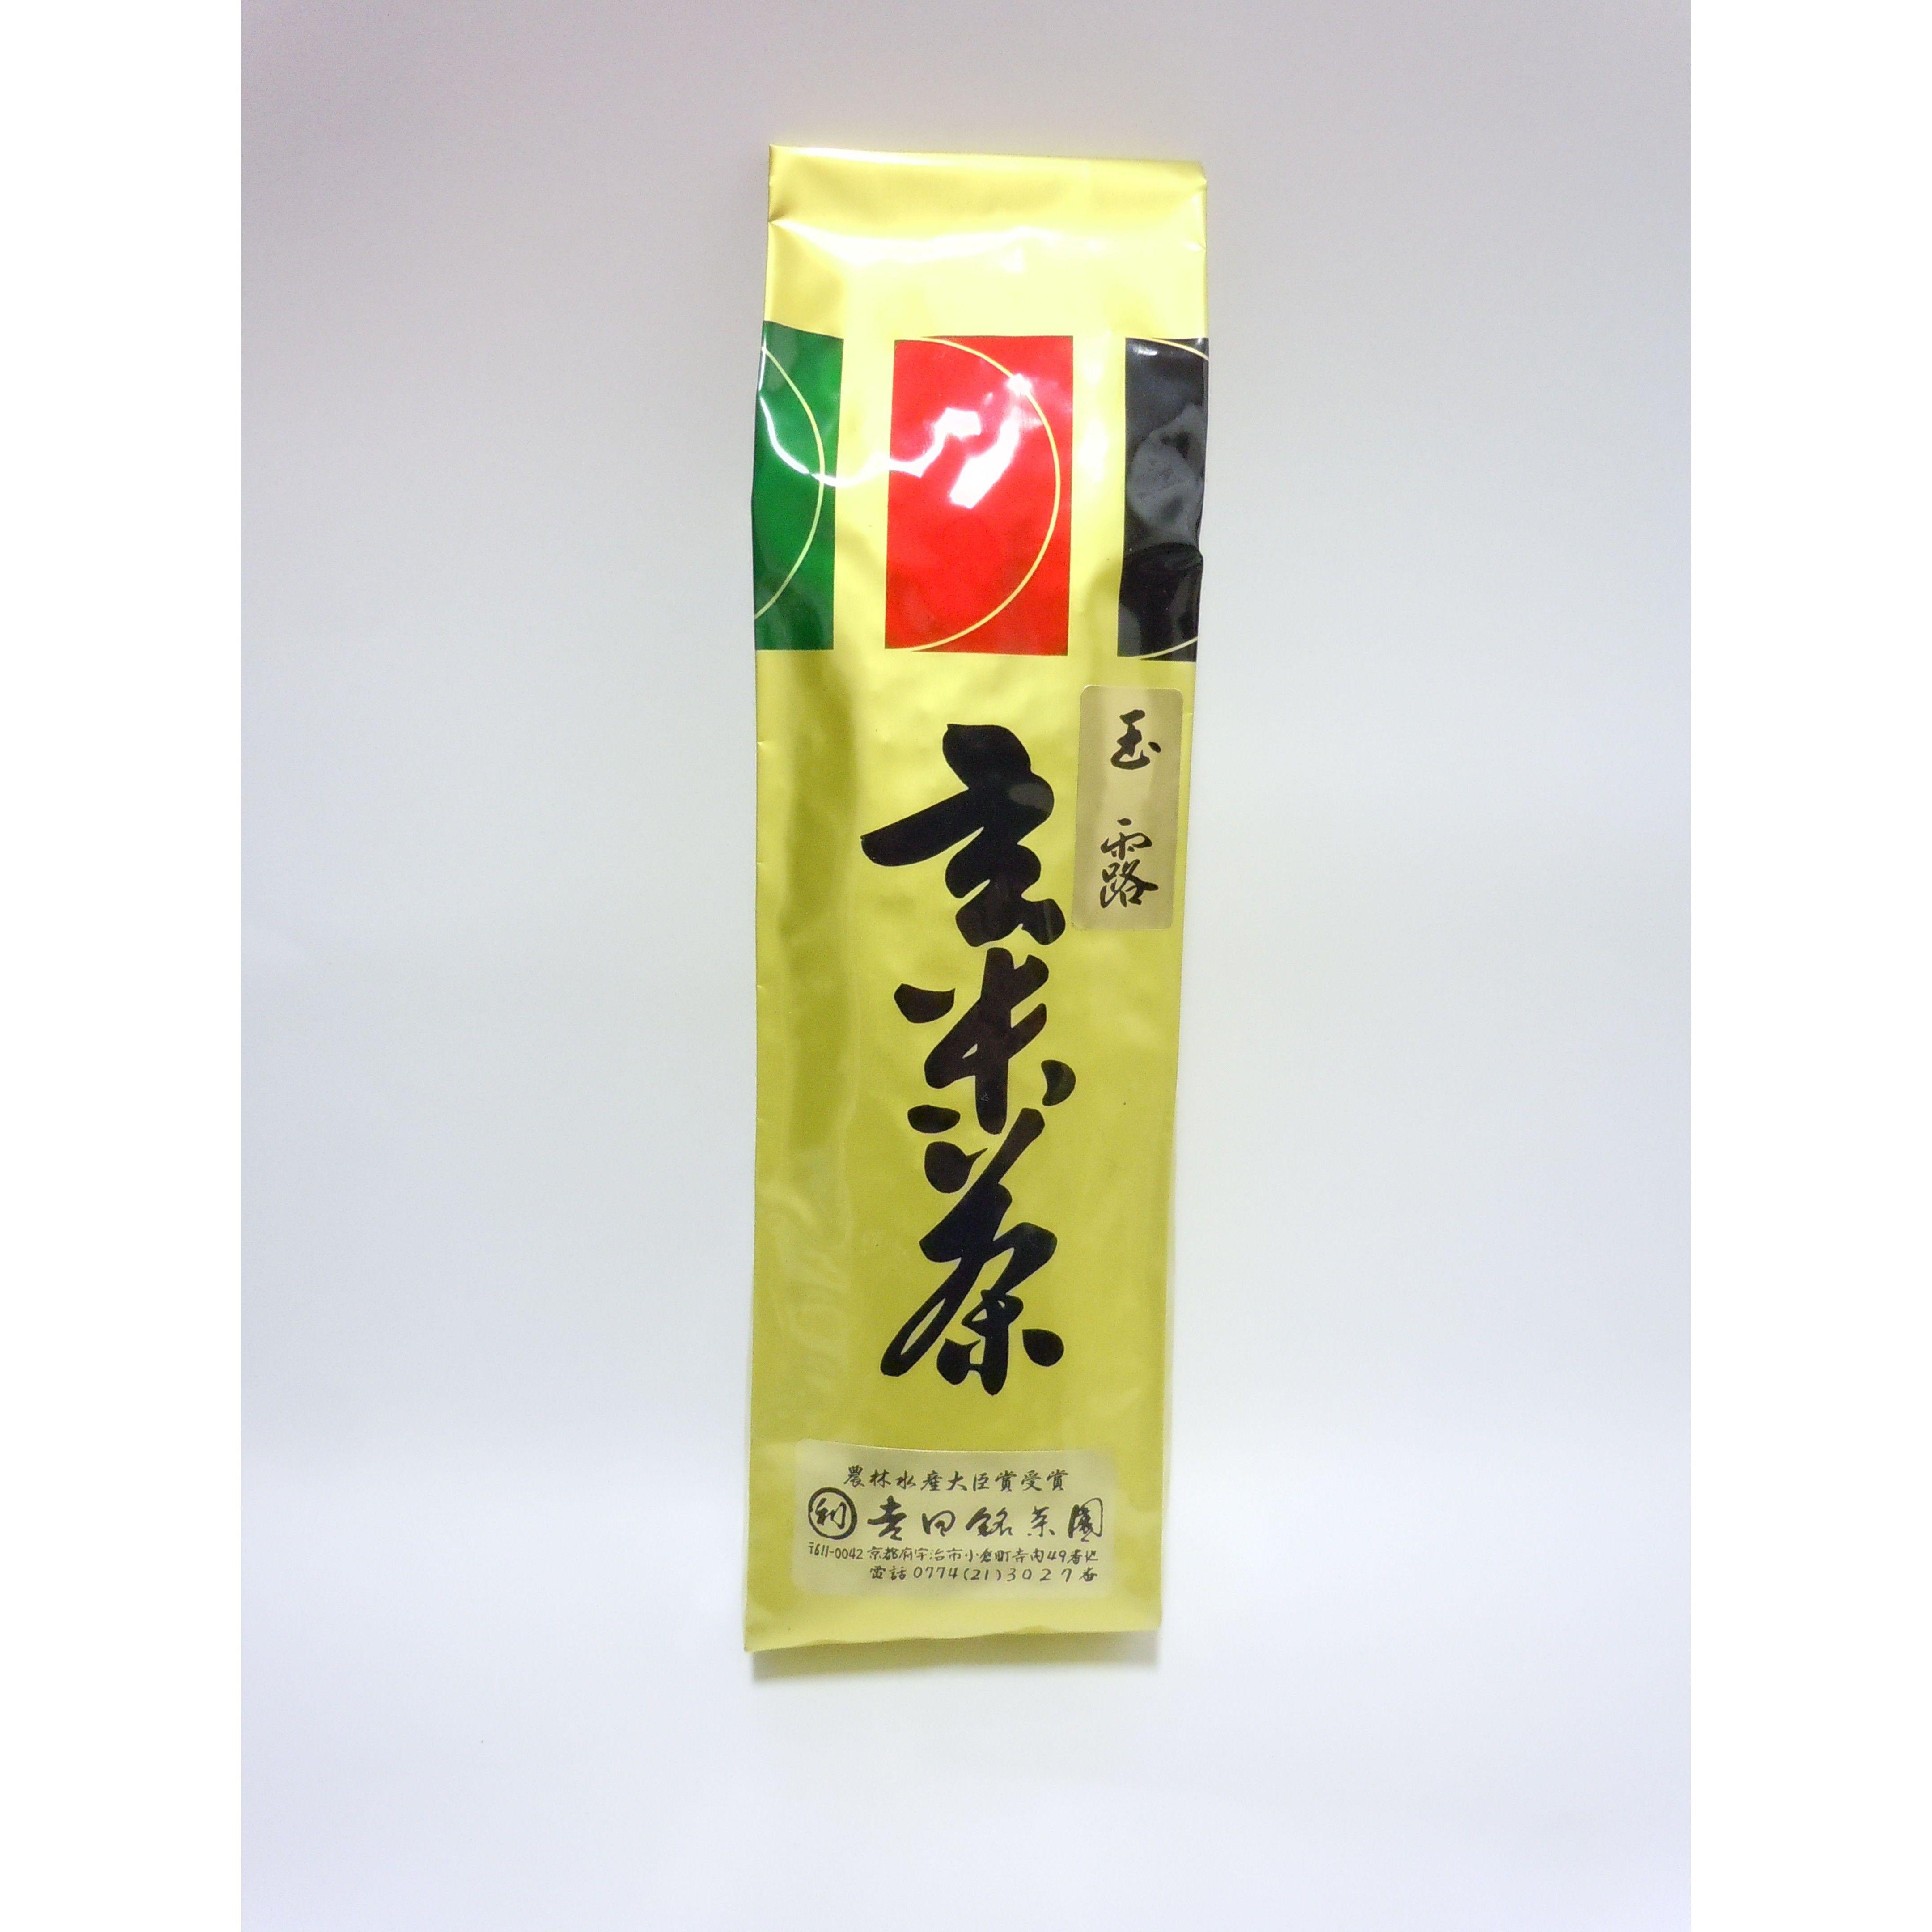 玉露玄米茶200g袋入り